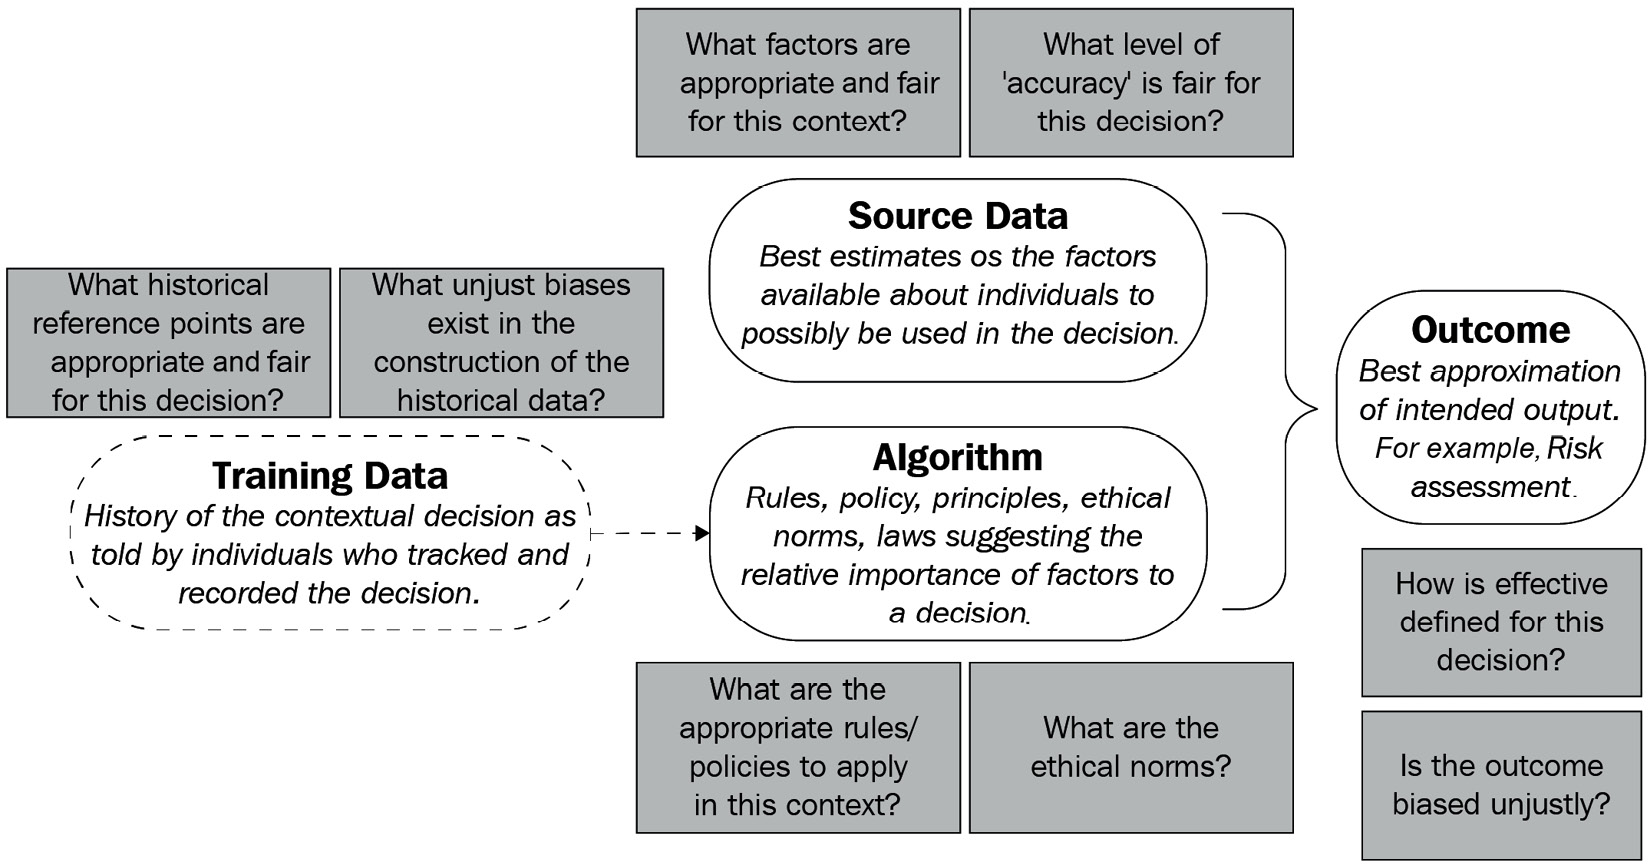 Figure 1.5 – Martin's algorithm morality model